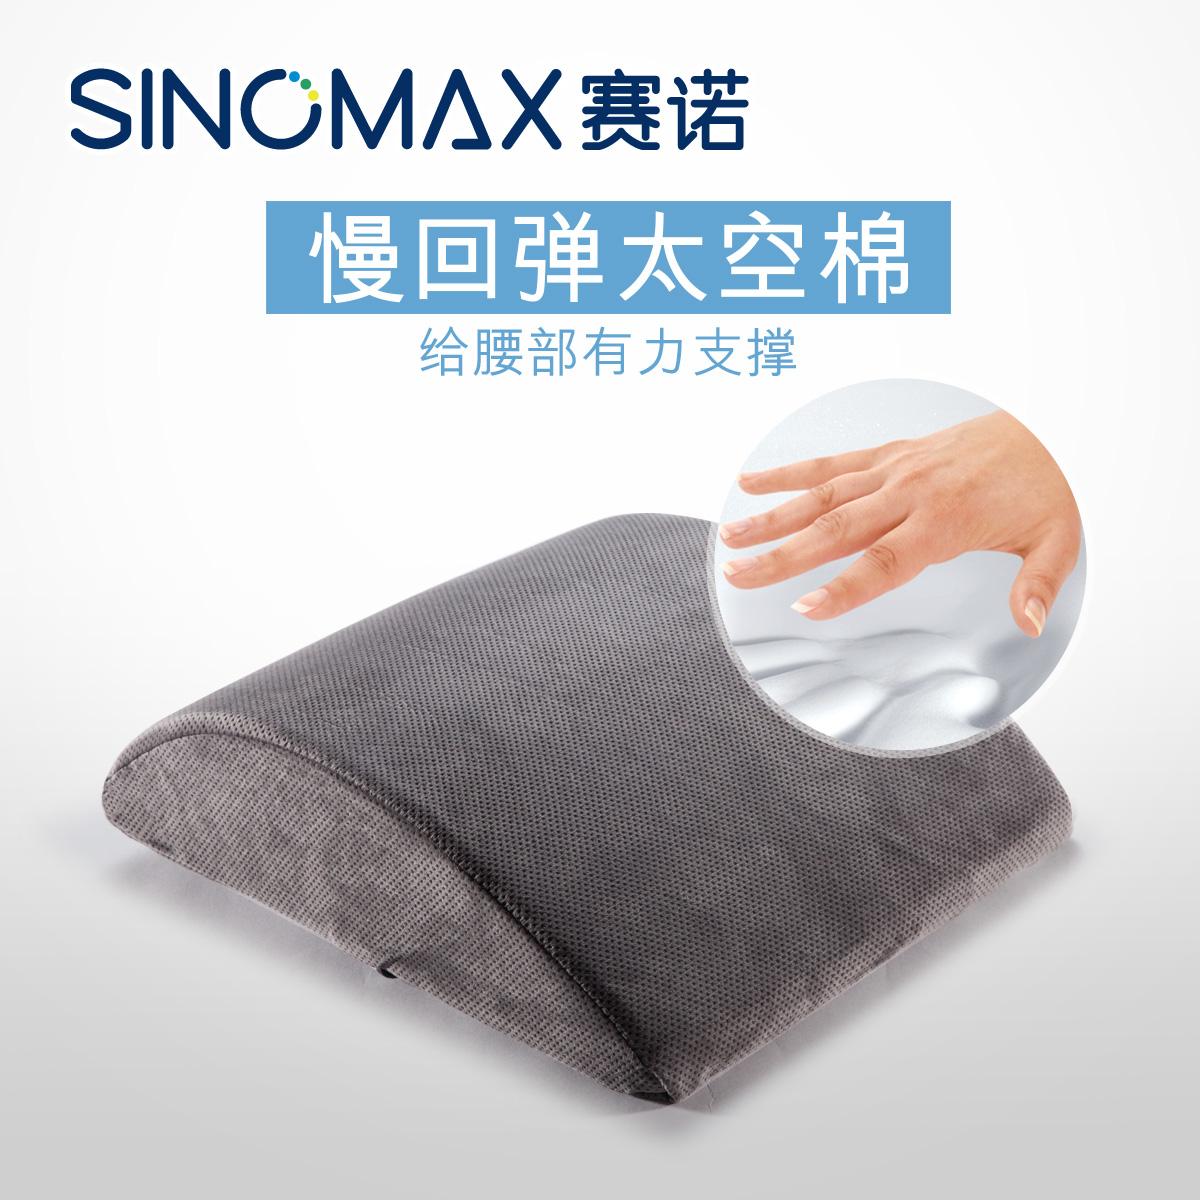 Sinomax Memory Foam Traditional Travel Pillow : SINOMAX Shiner waist cushion memory foam lumbar support office chair cushion waist support ...